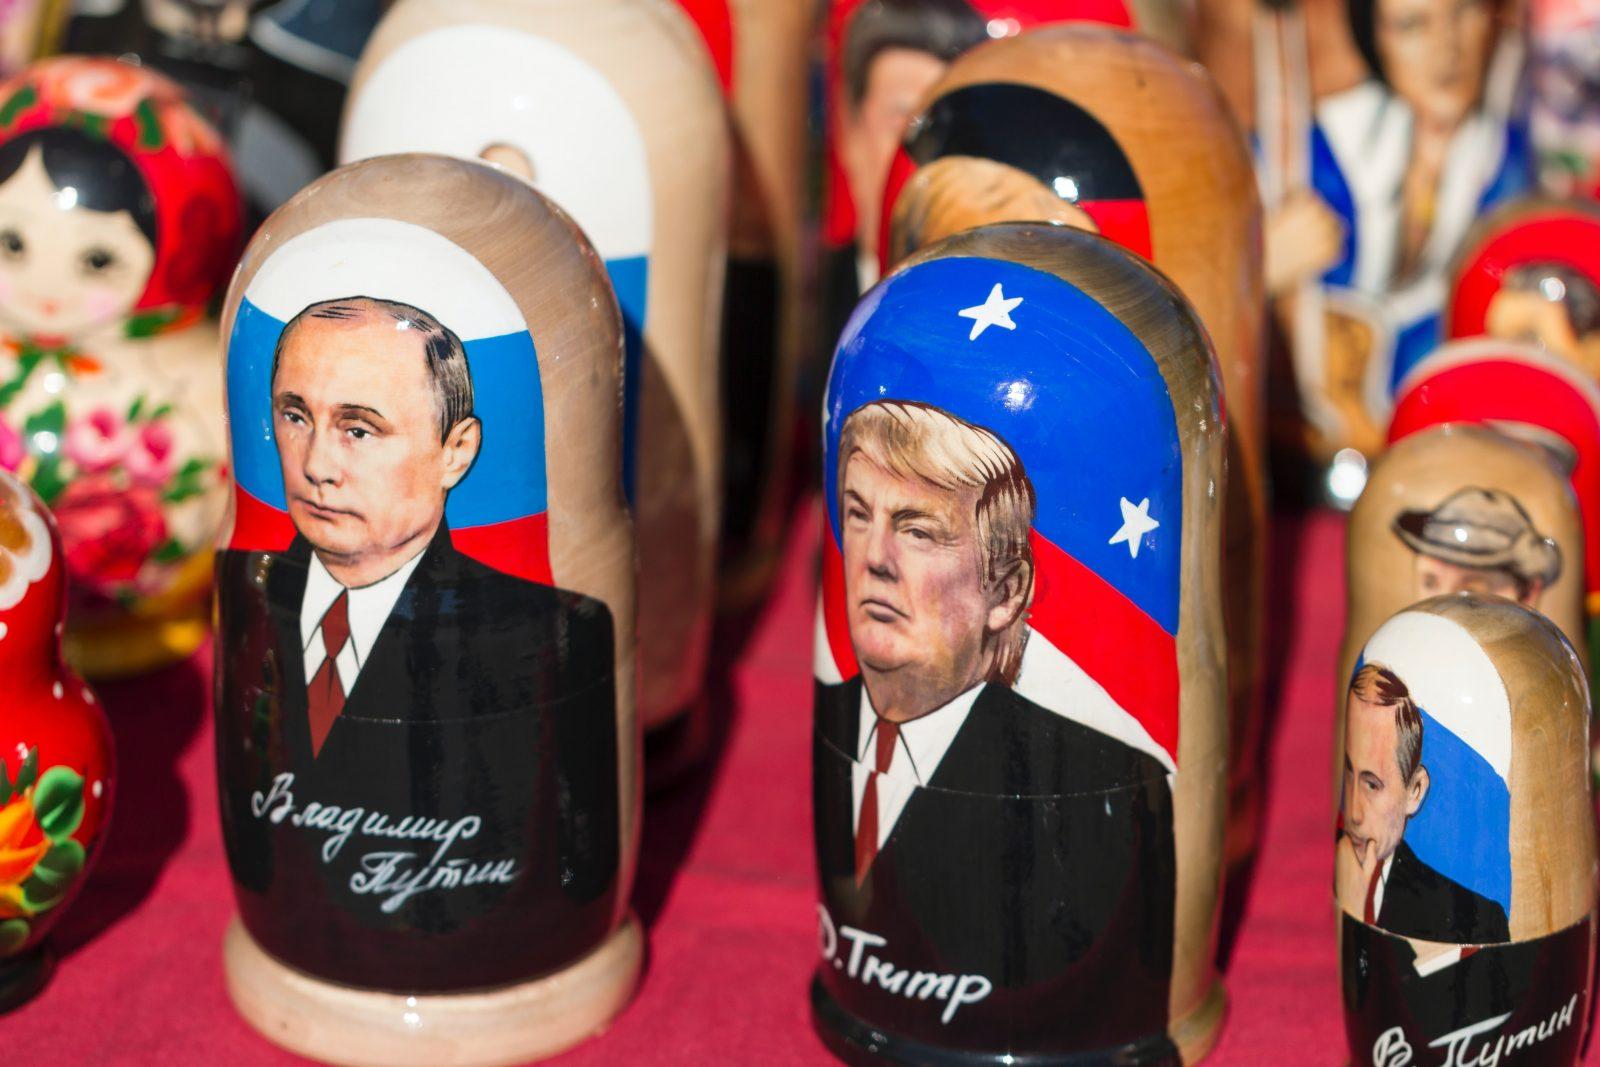 Trump and Putin: A Kremlin Arranged Marriage